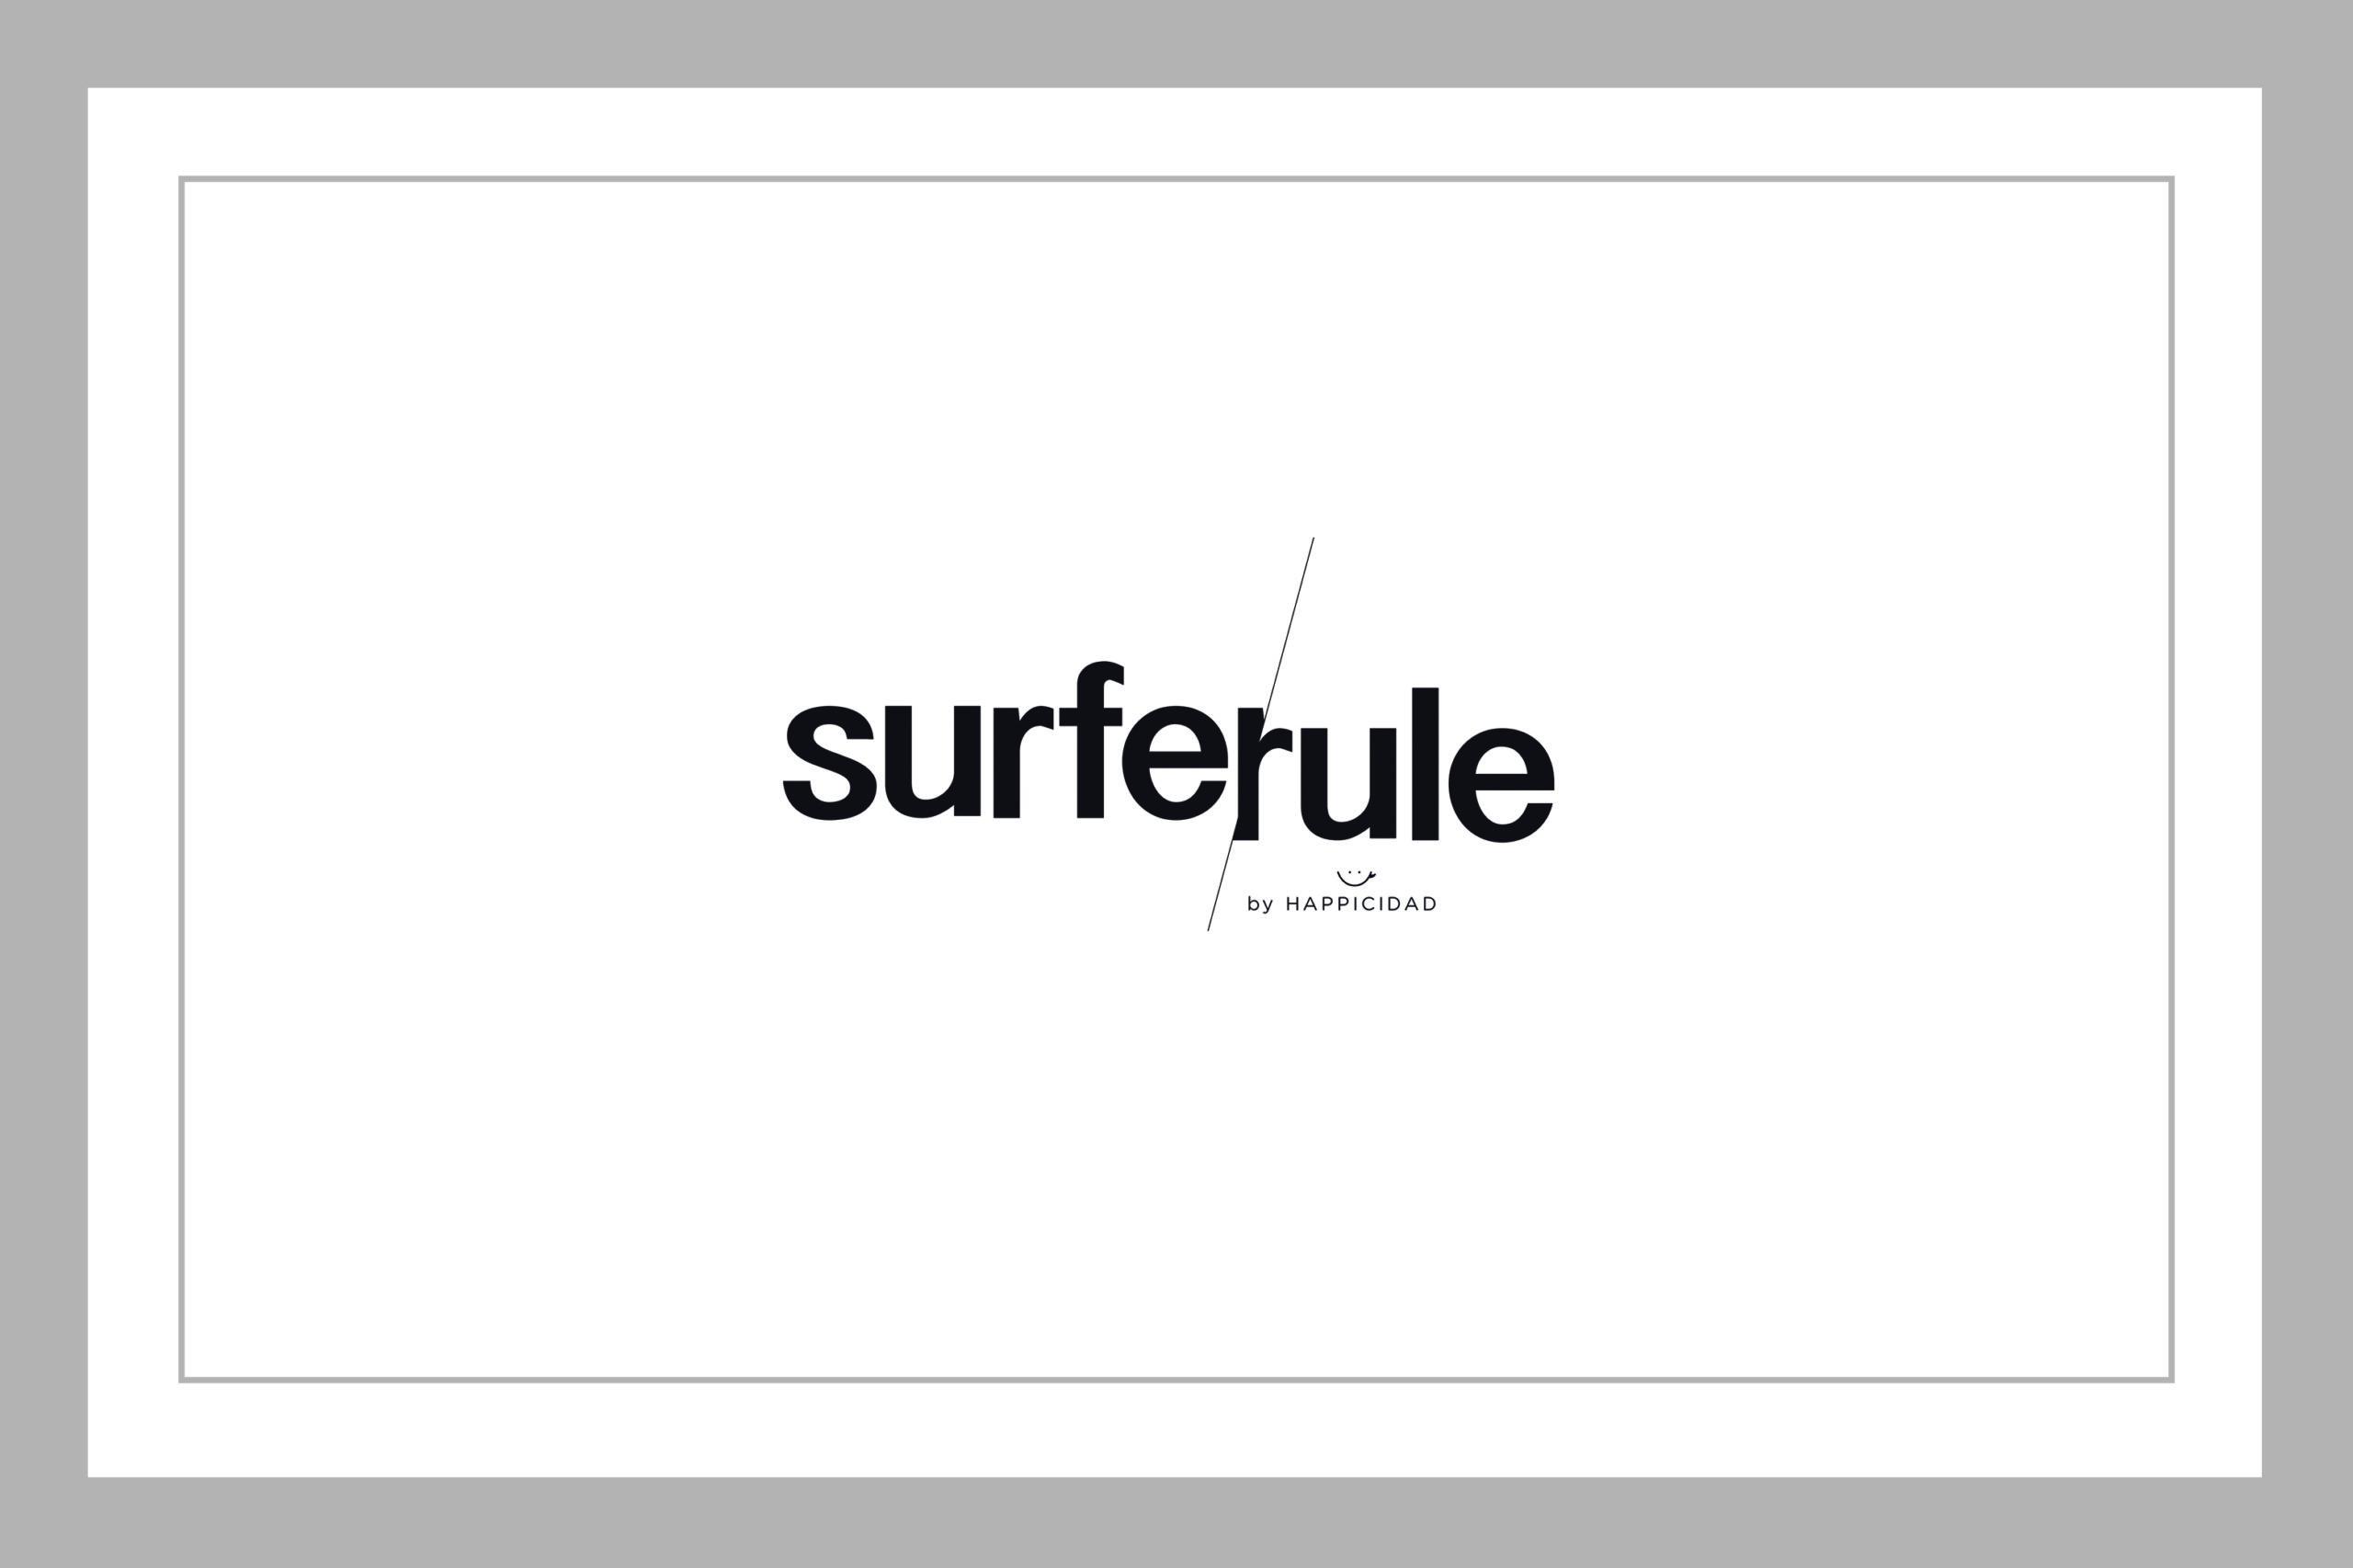 destacada prensa Surfer Rule